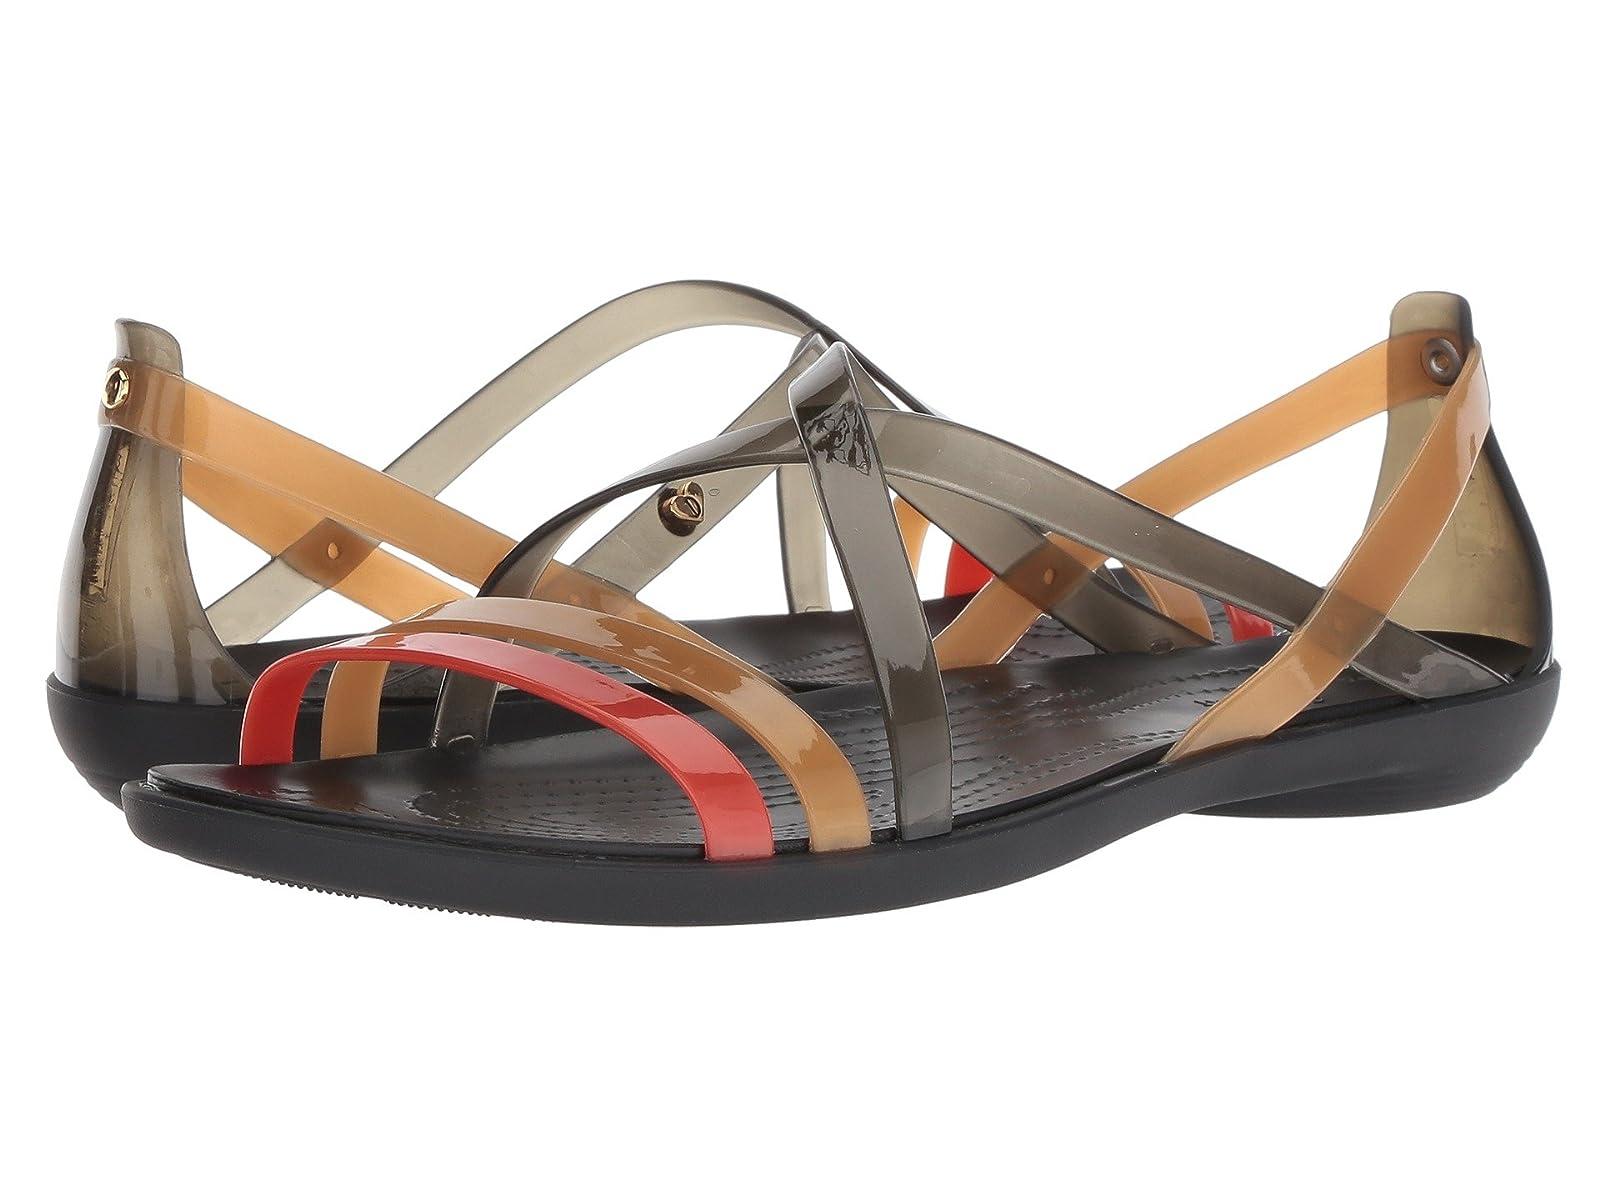 Crocs Sandal Drew x Crocs Isabella Sandal Crocs 38c23f